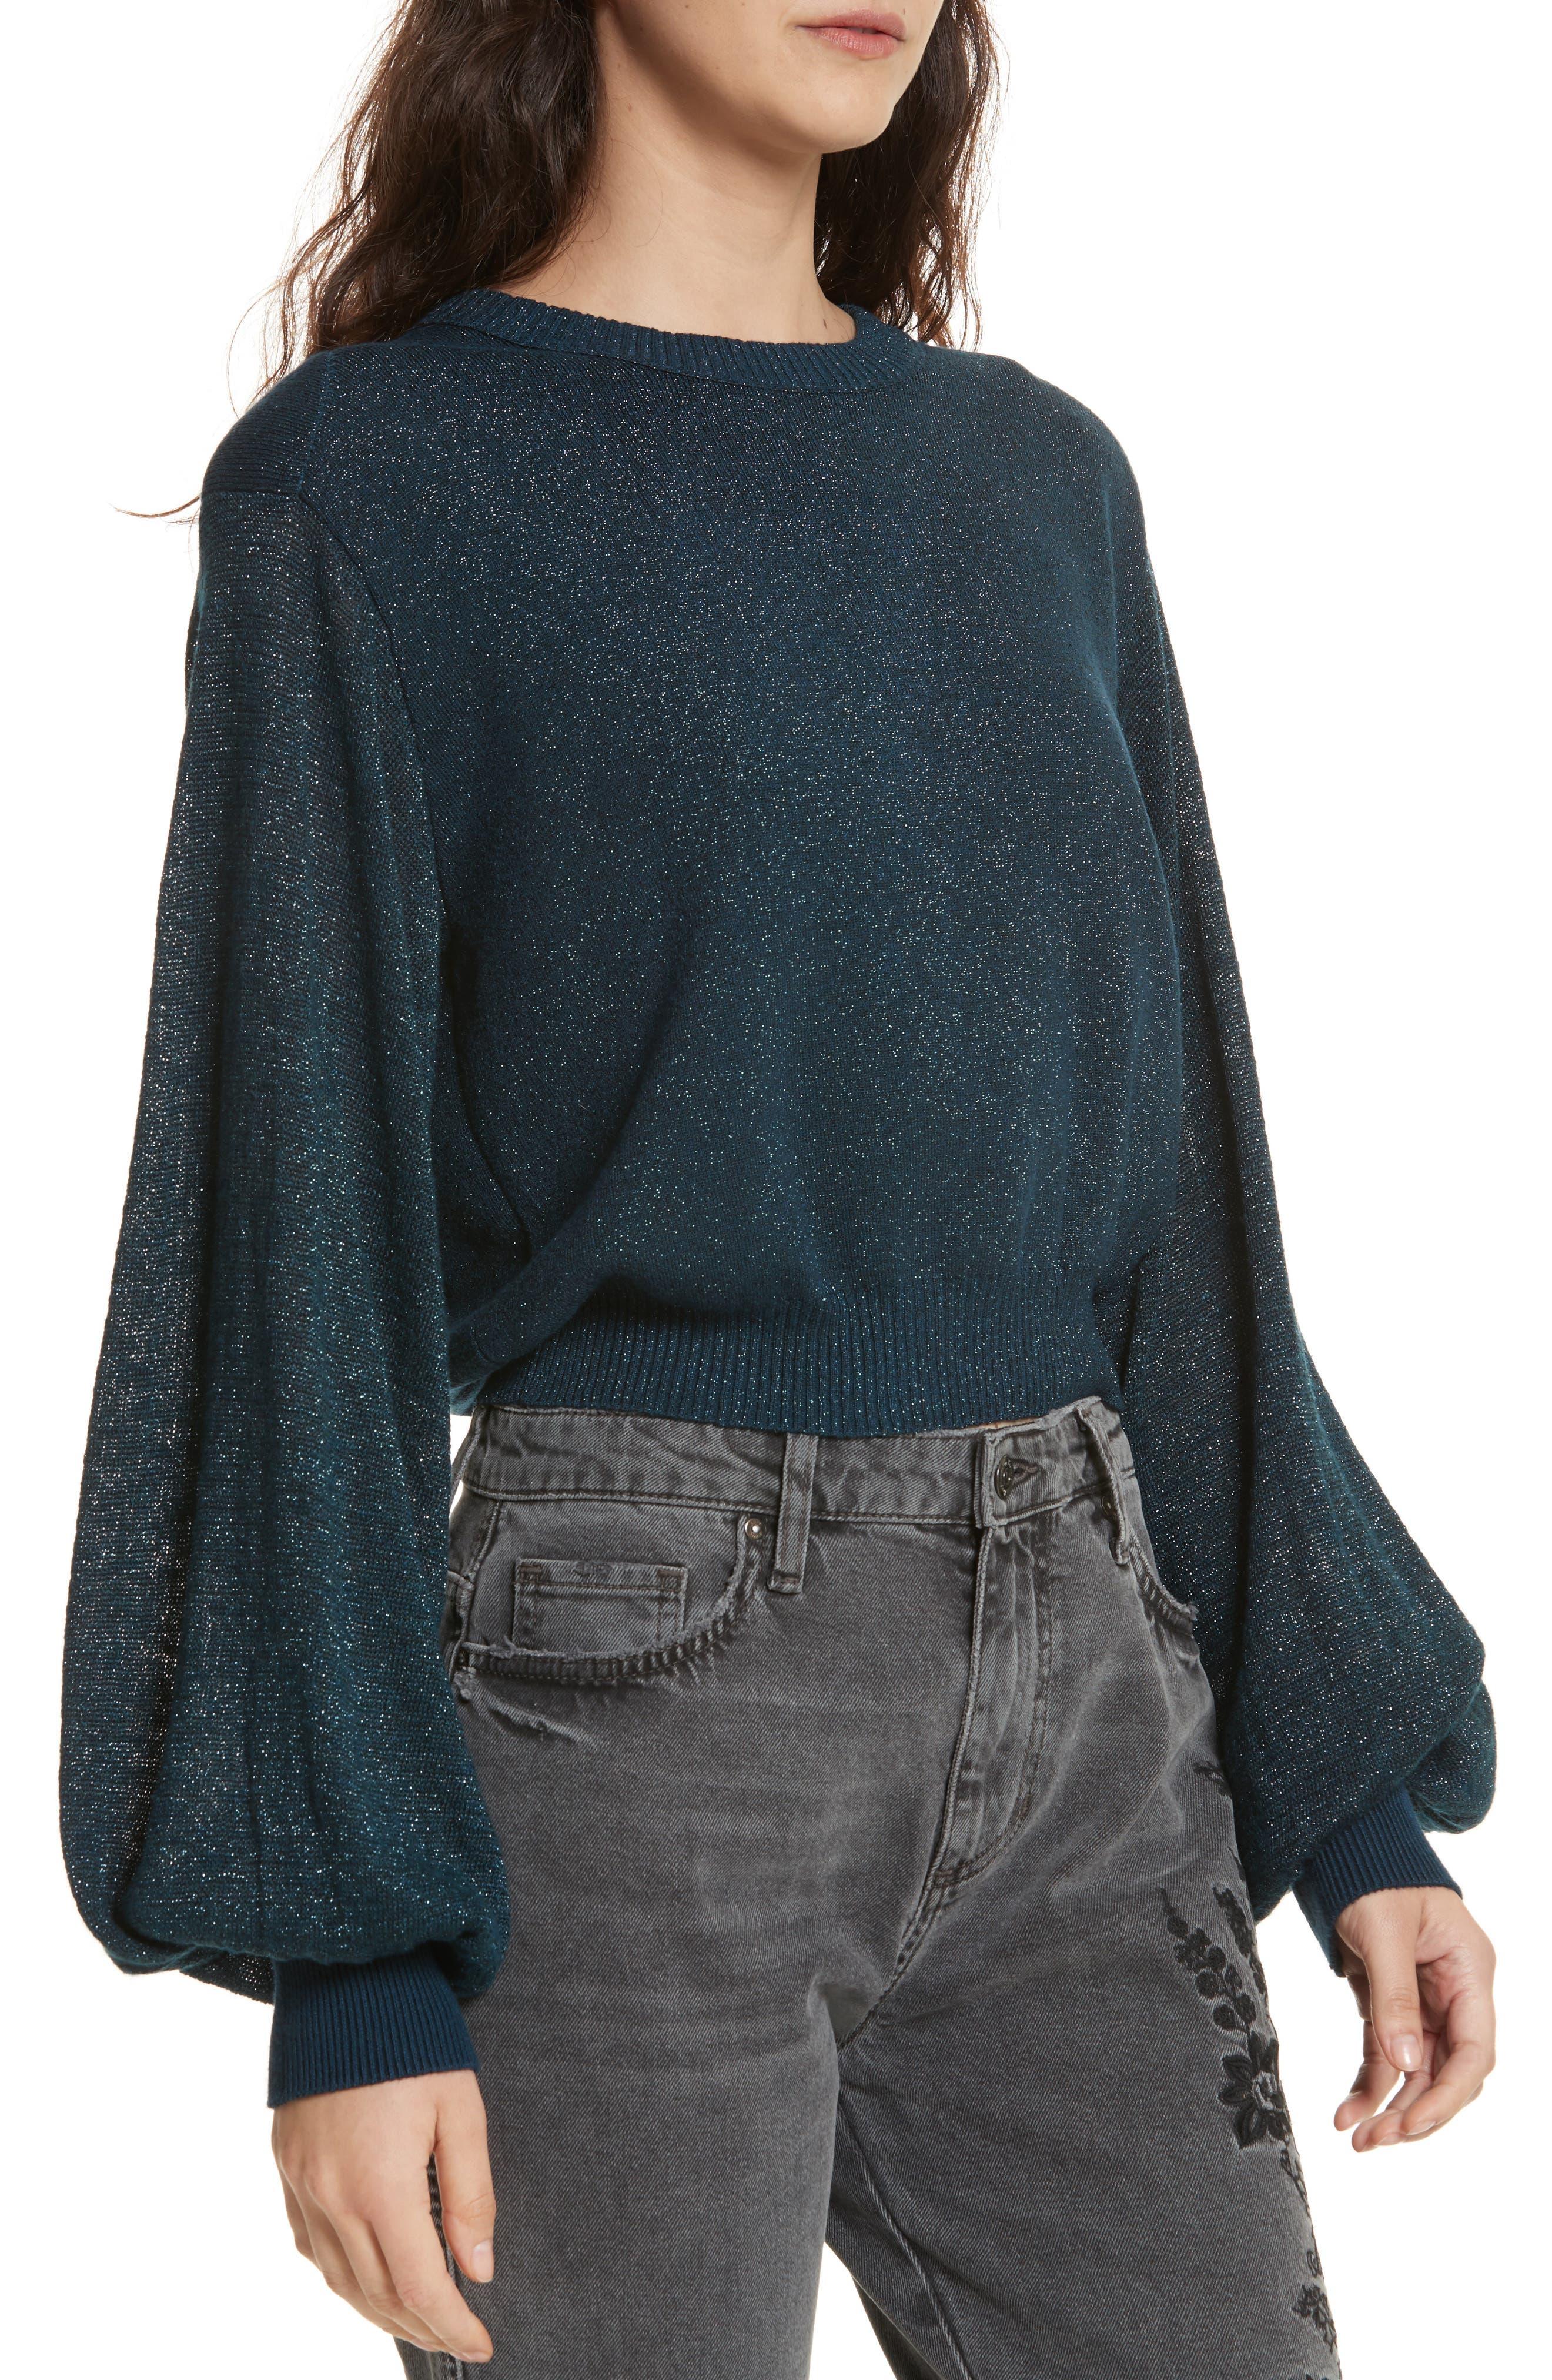 Let it Shine Sweater,                             Alternate thumbnail 4, color,                             Navy